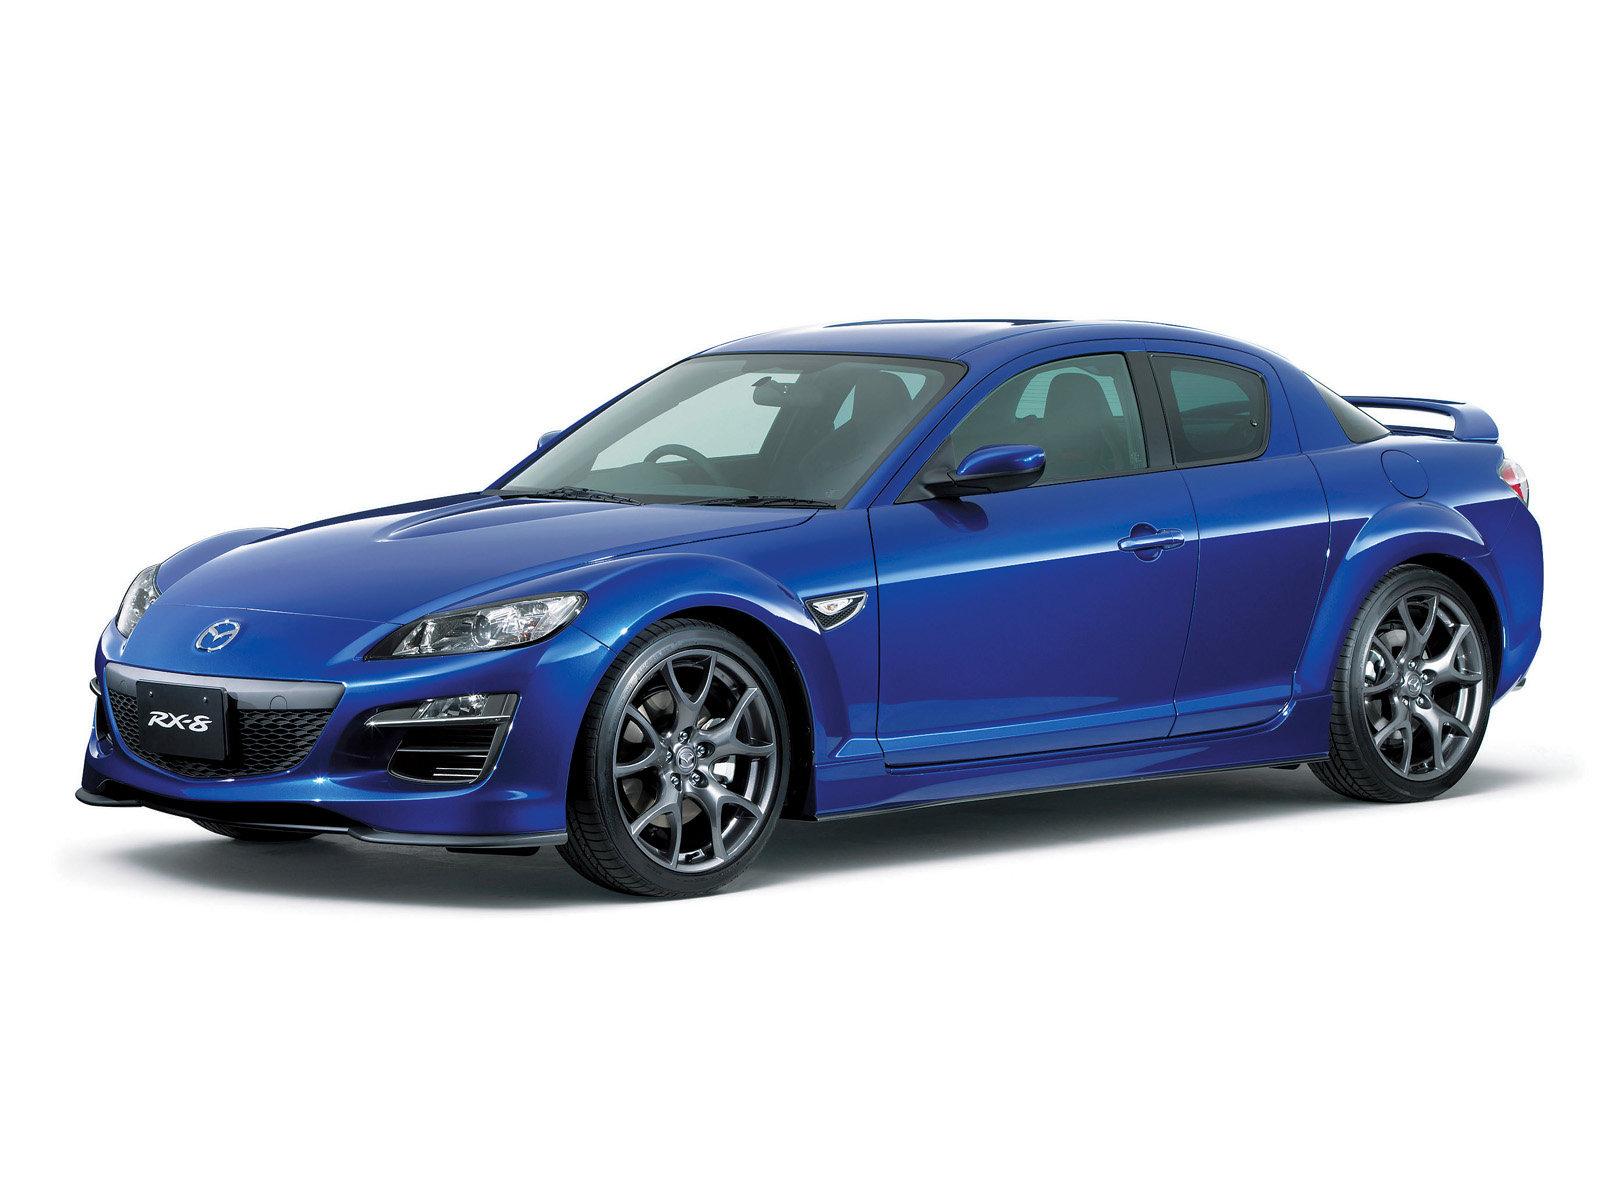 Mazda rx-8 photo #12